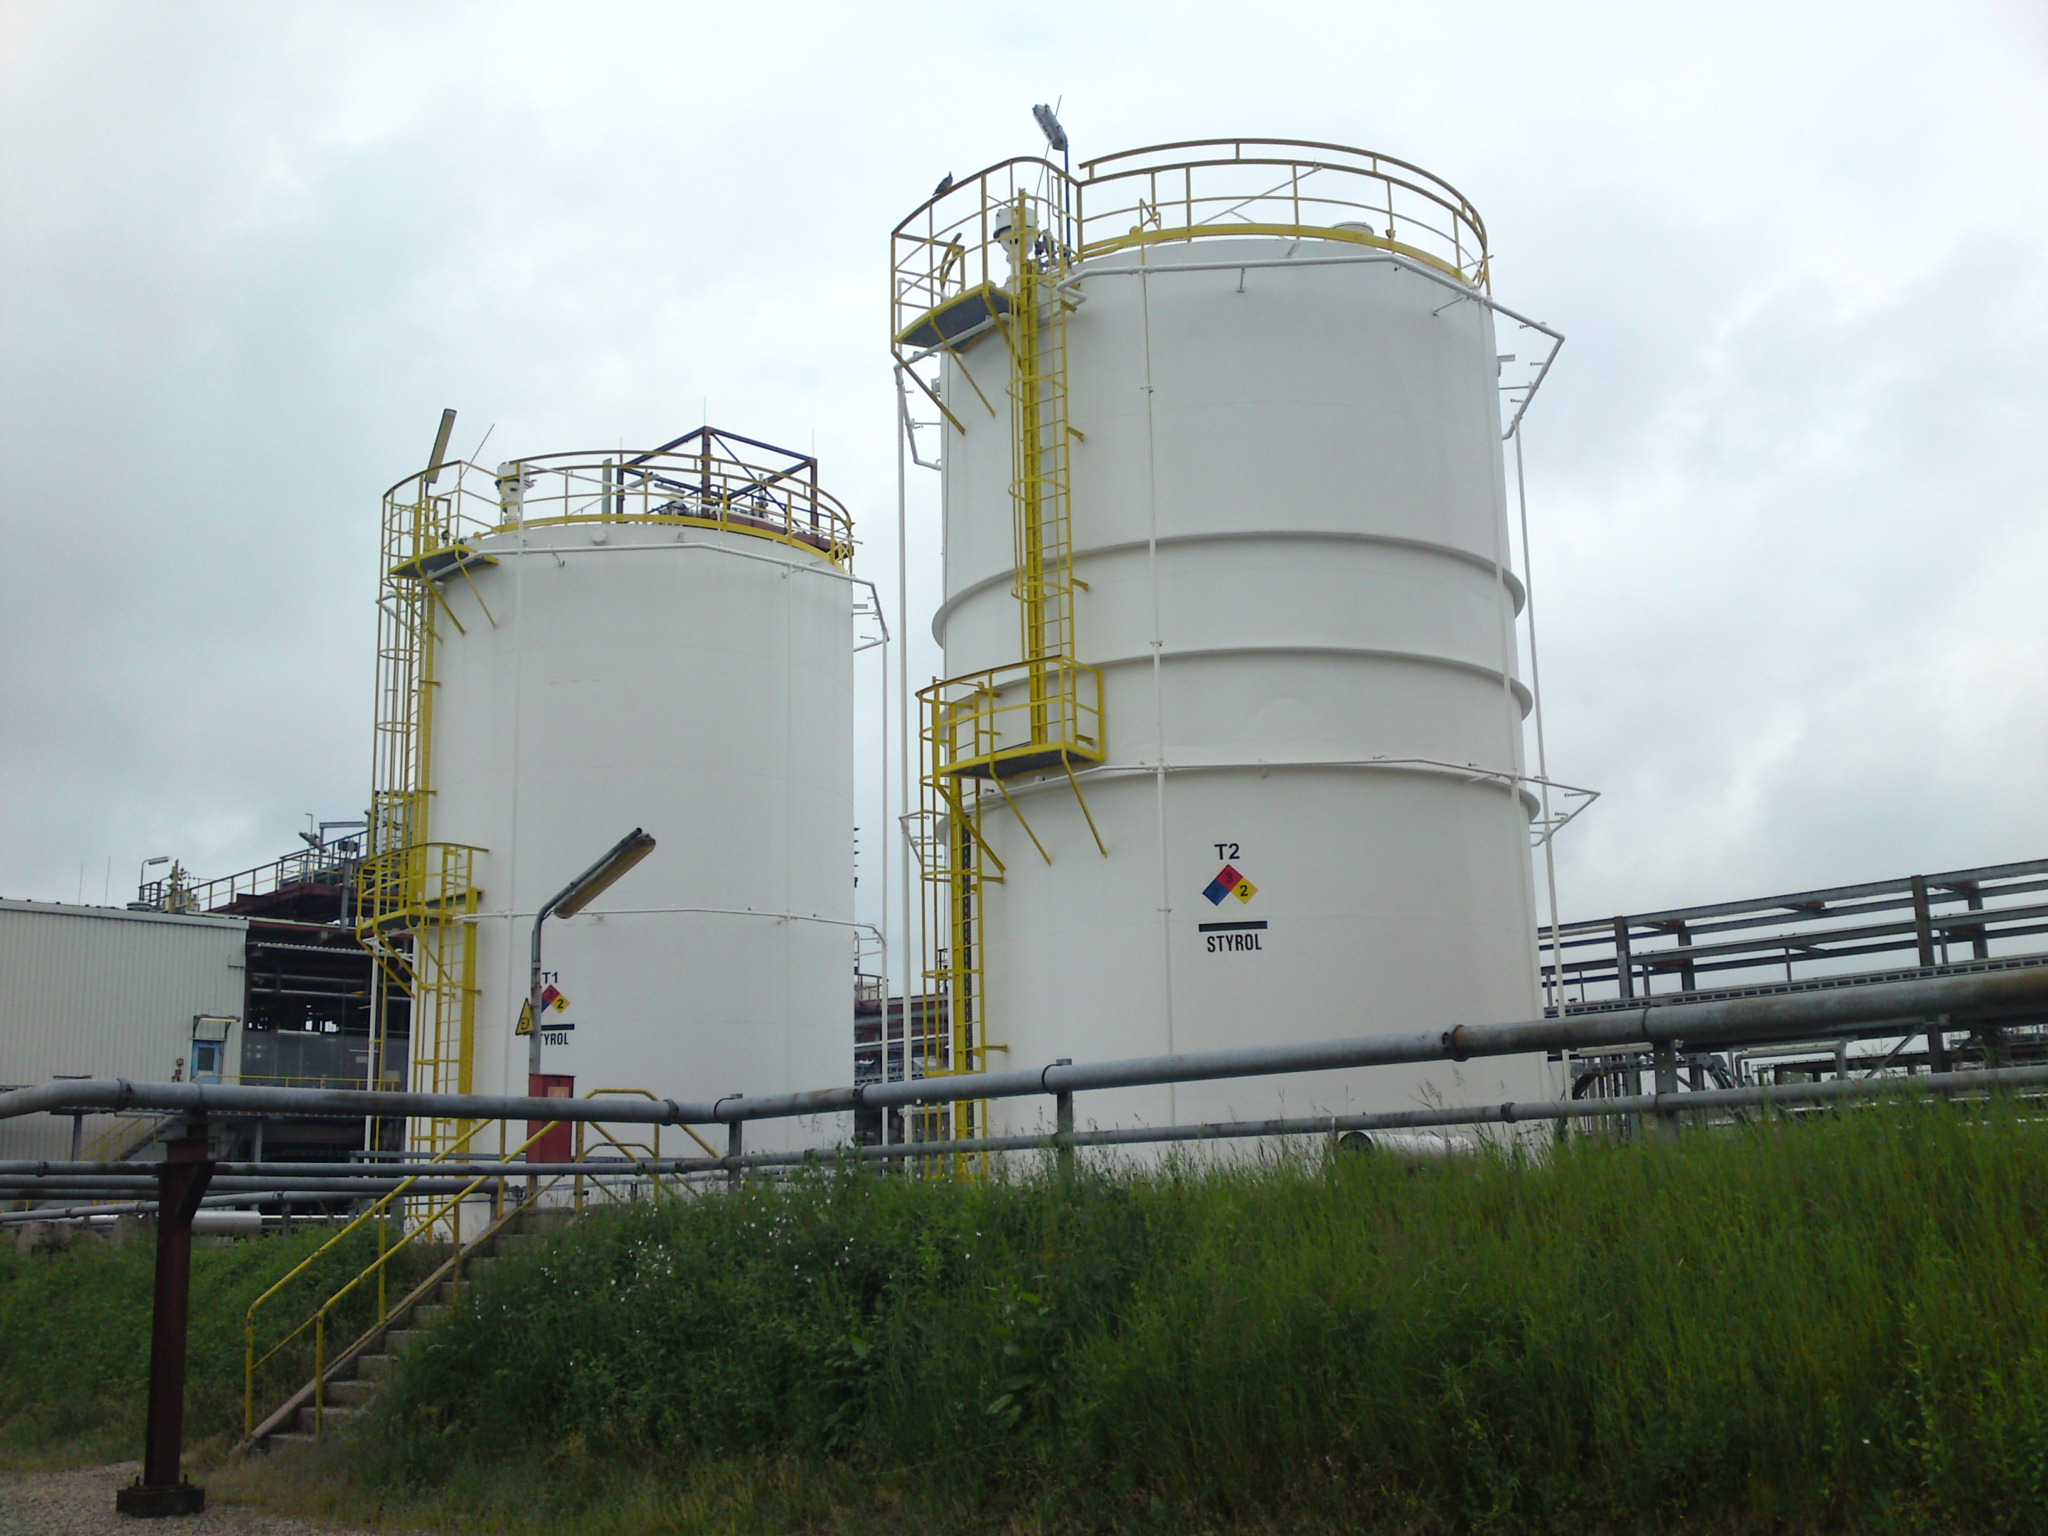 https://0501.nccdn.net/4_2/000/000/046/6ea/Tank-Dow-Chemikal.JPG